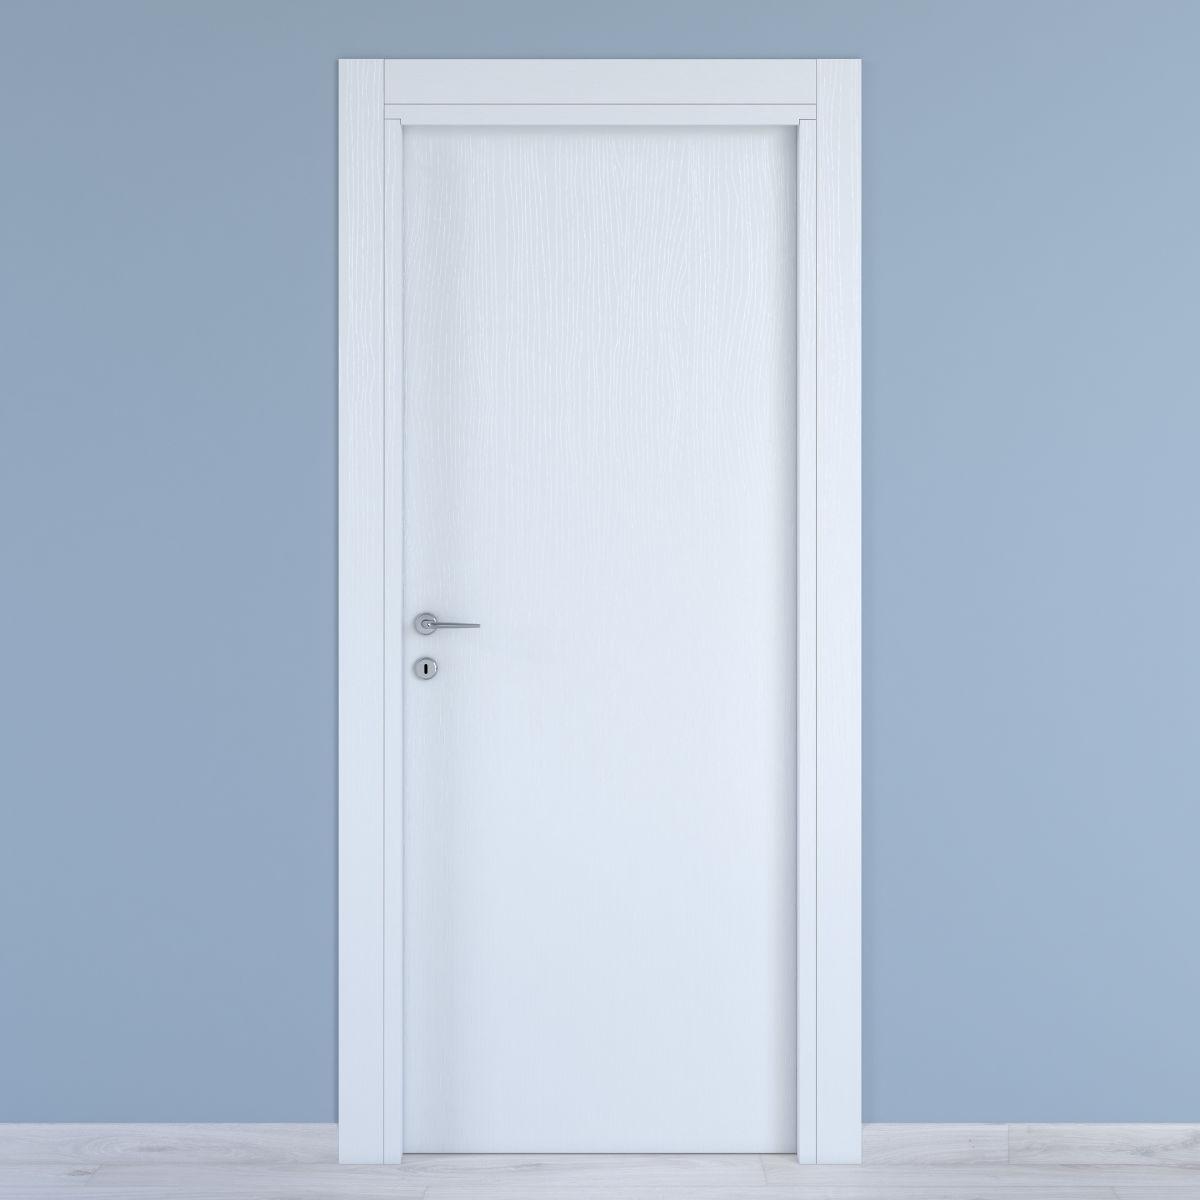 Offerte porte blindate leroy merlin in legno pareti for Porte leroy merlin blindate